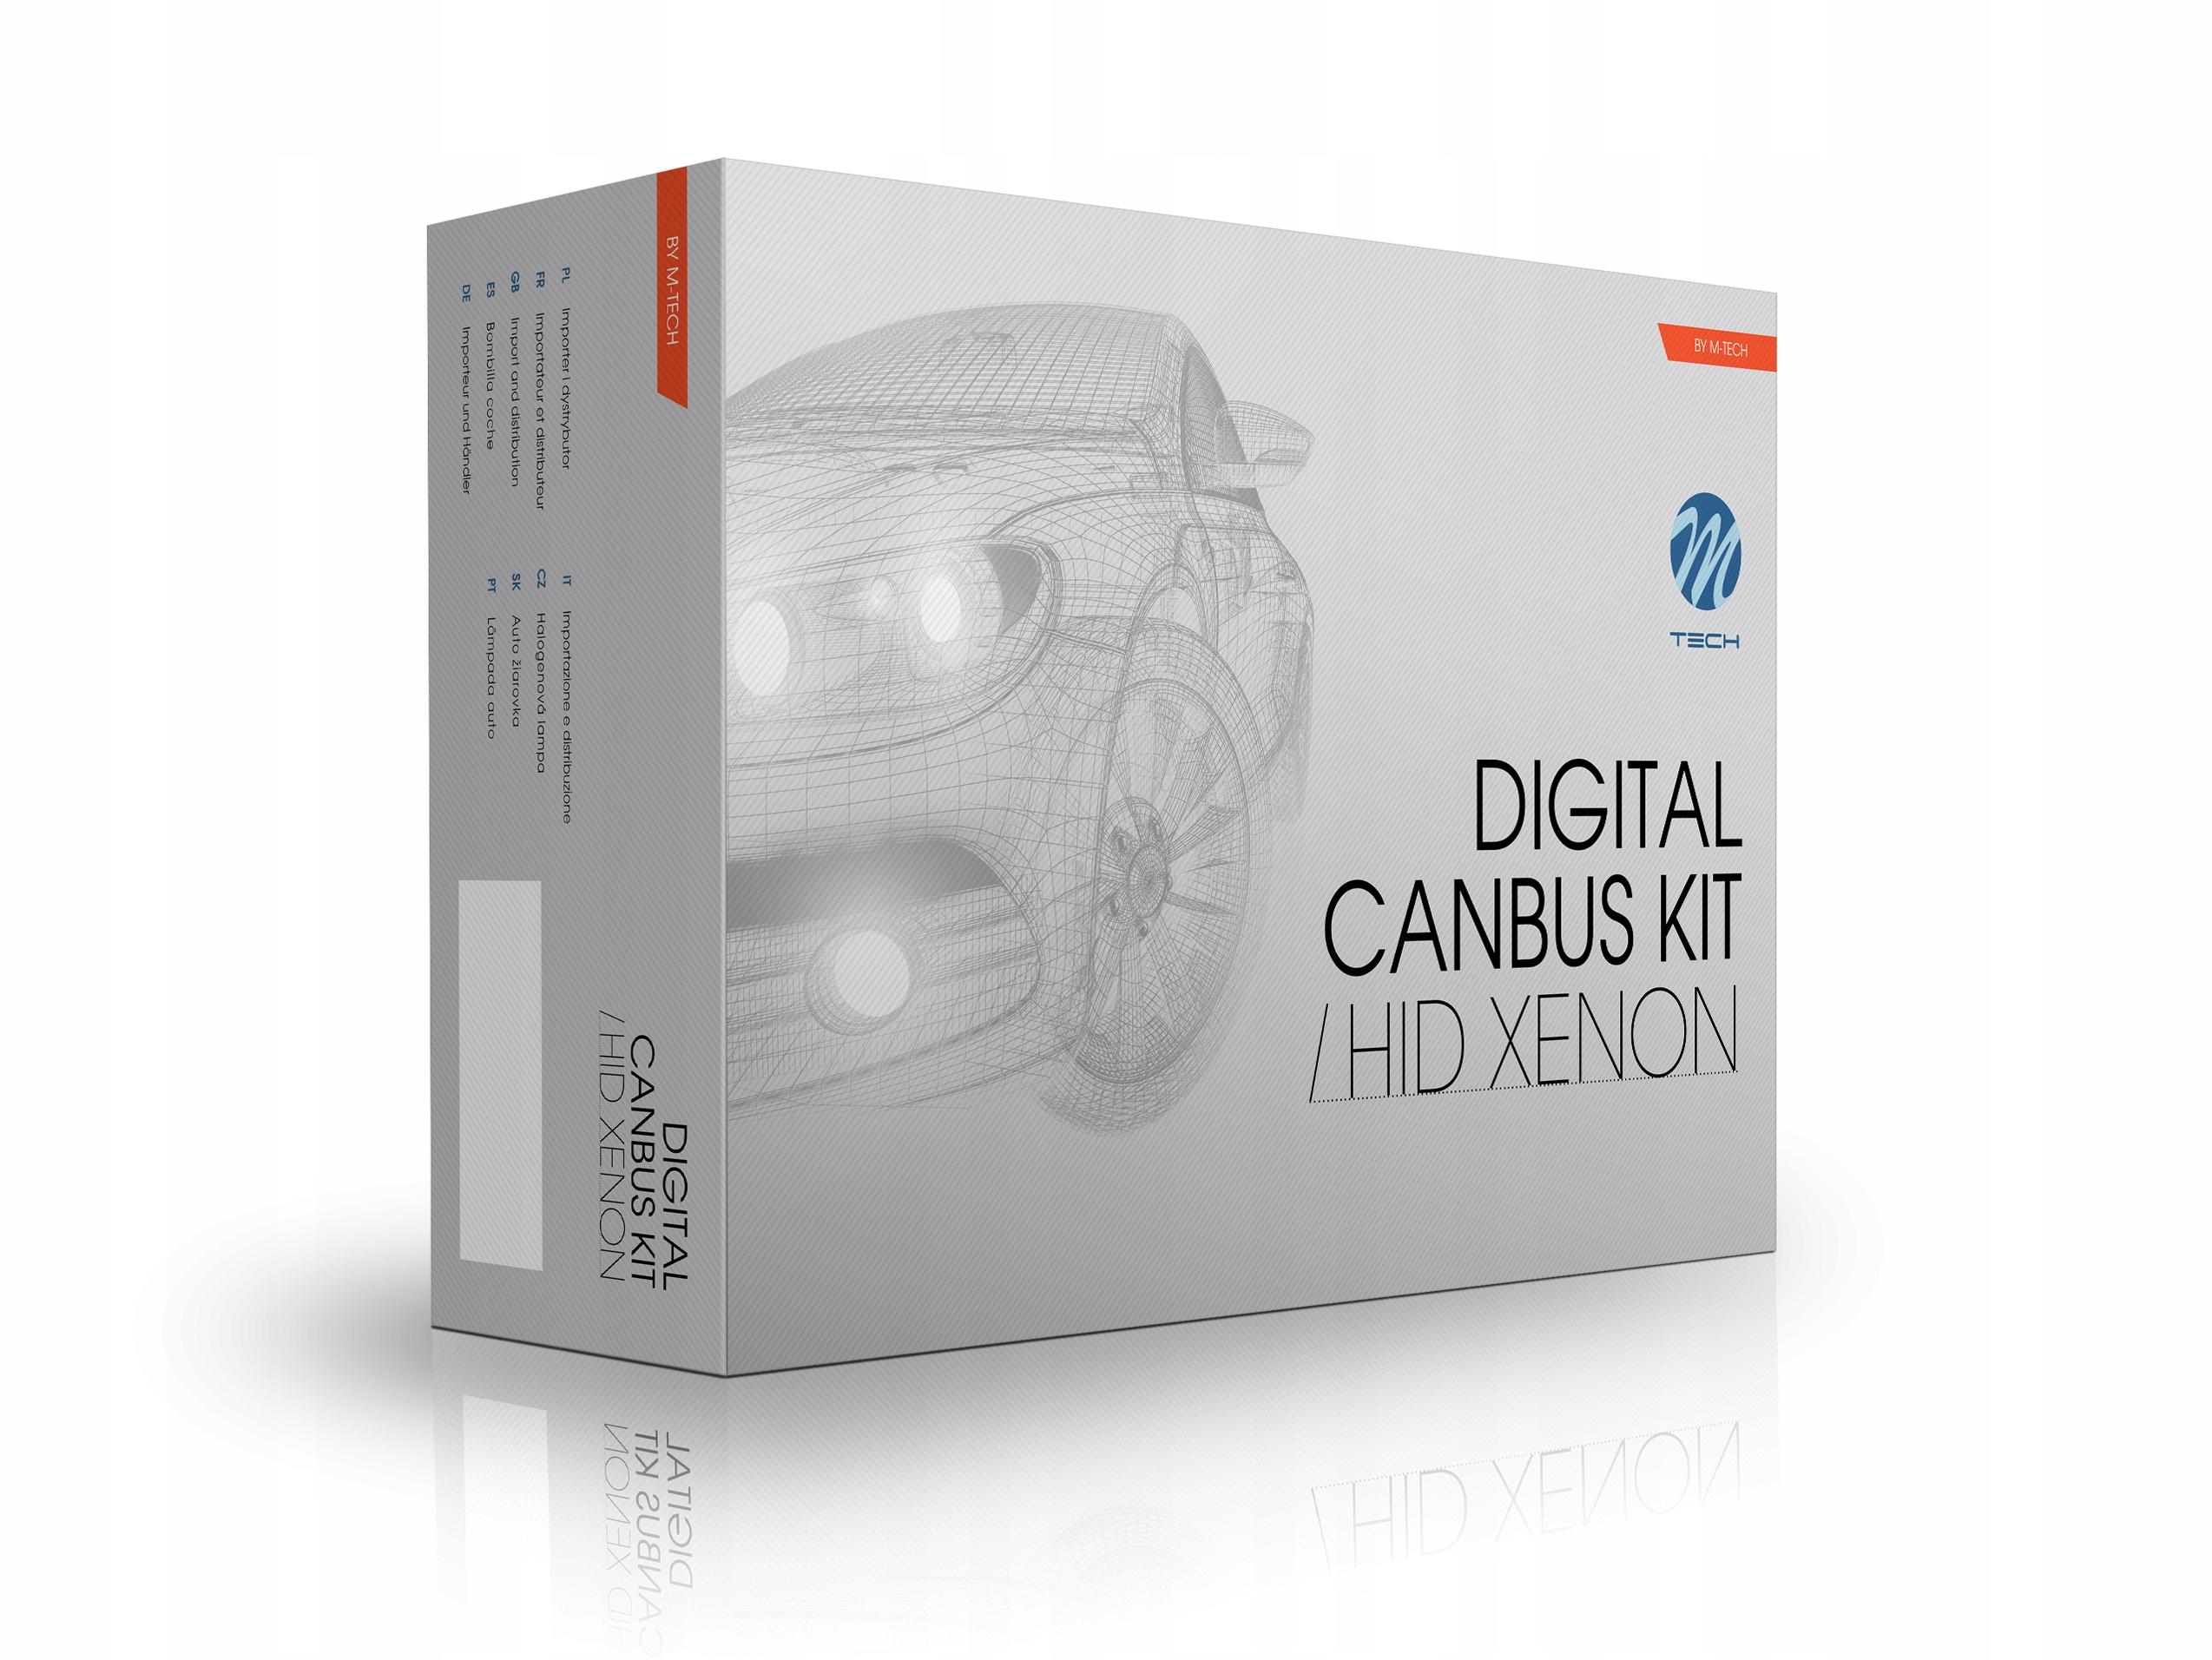 комплект ксенон hid h1 h7 43006000 m-tech canbus pro